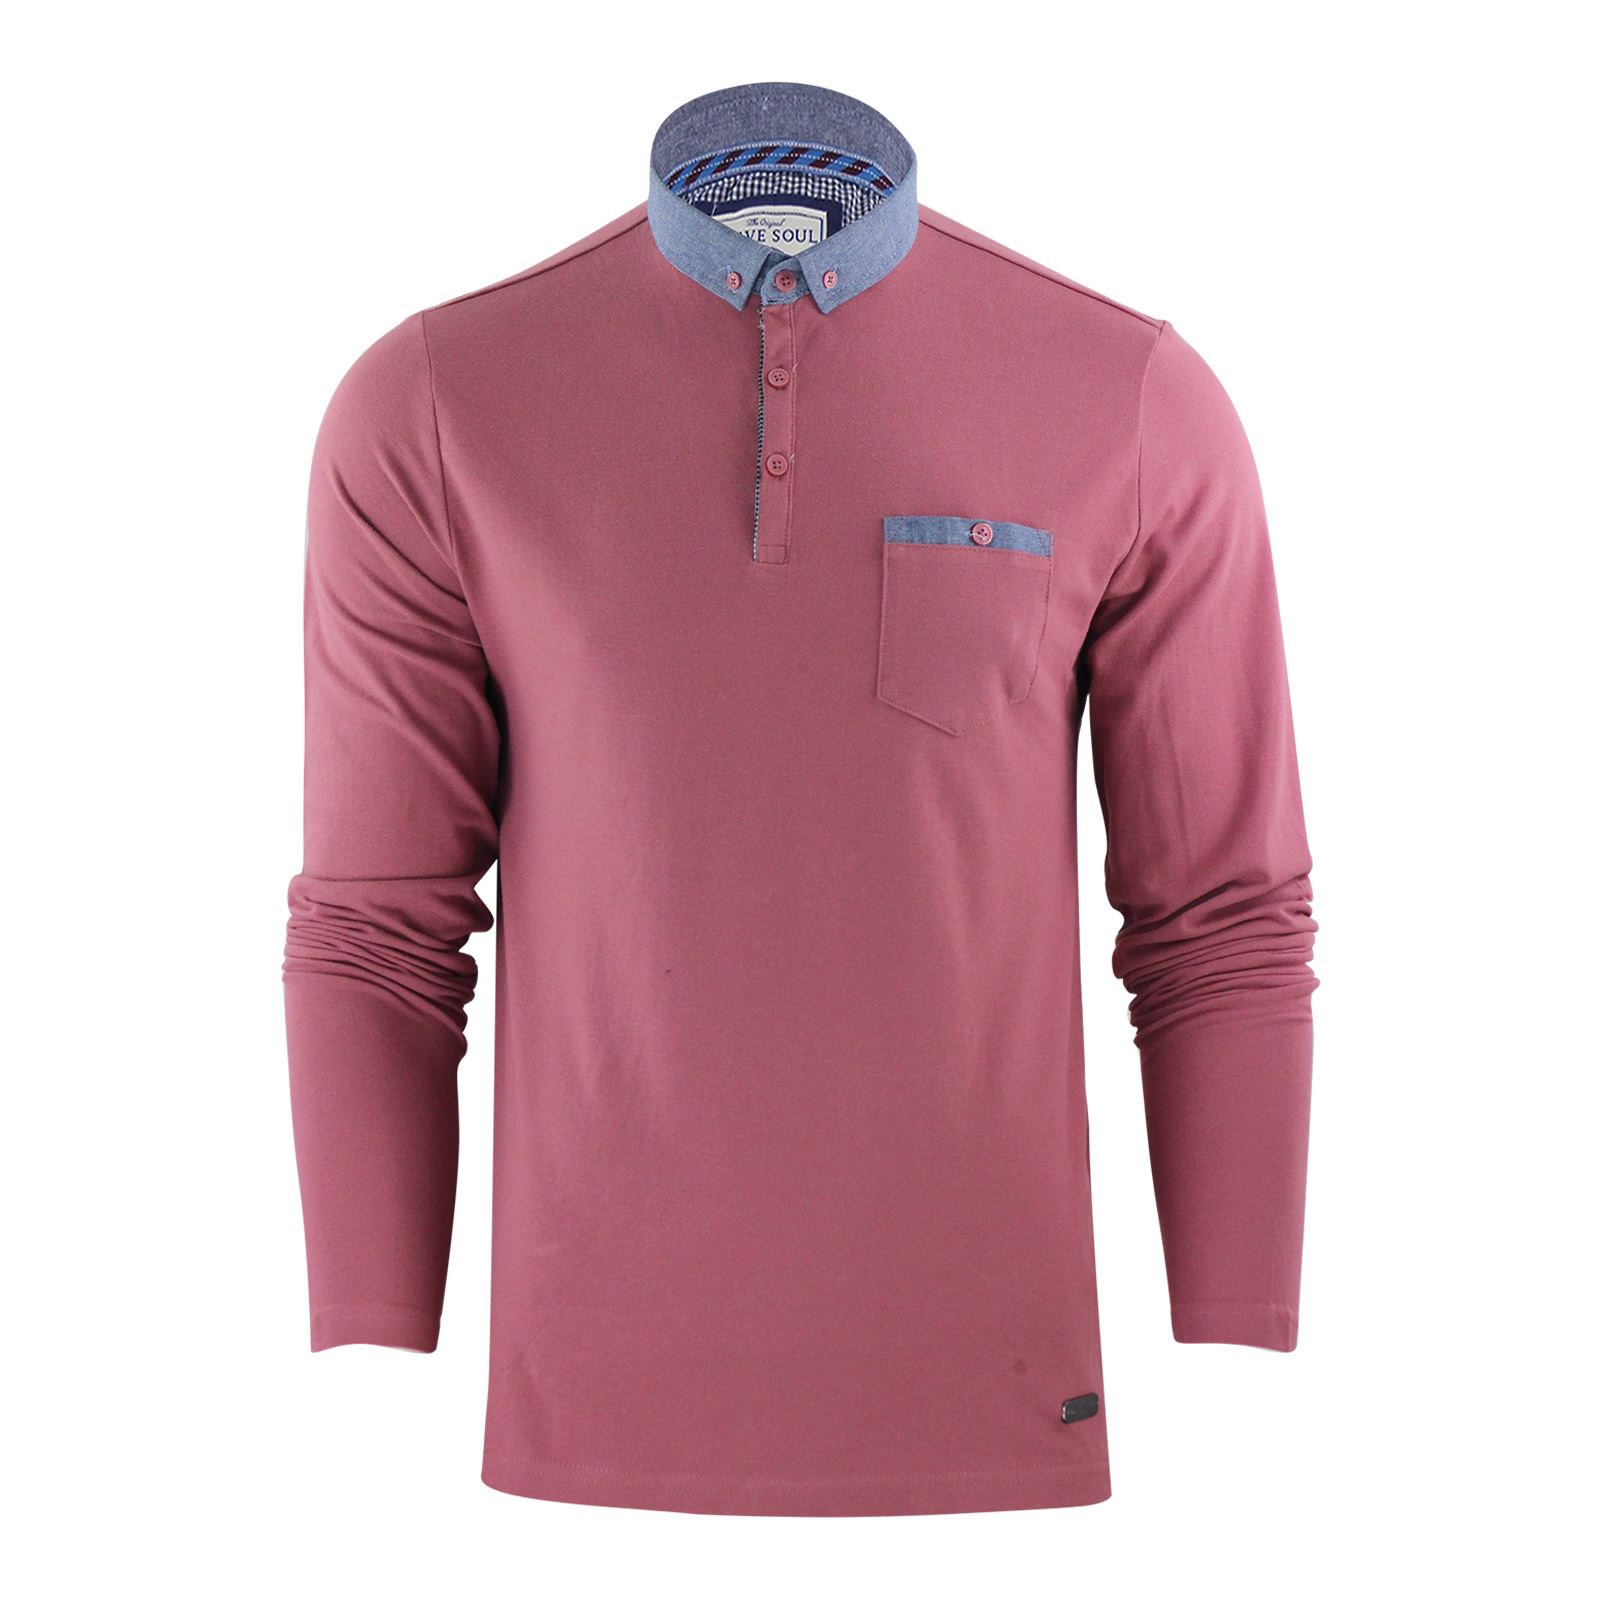 Para-Hombre-Polo-T-Shirt-Alma-valiente-Hera-Manga-Larga-De-Algodon-Casual-Top miniatura 14